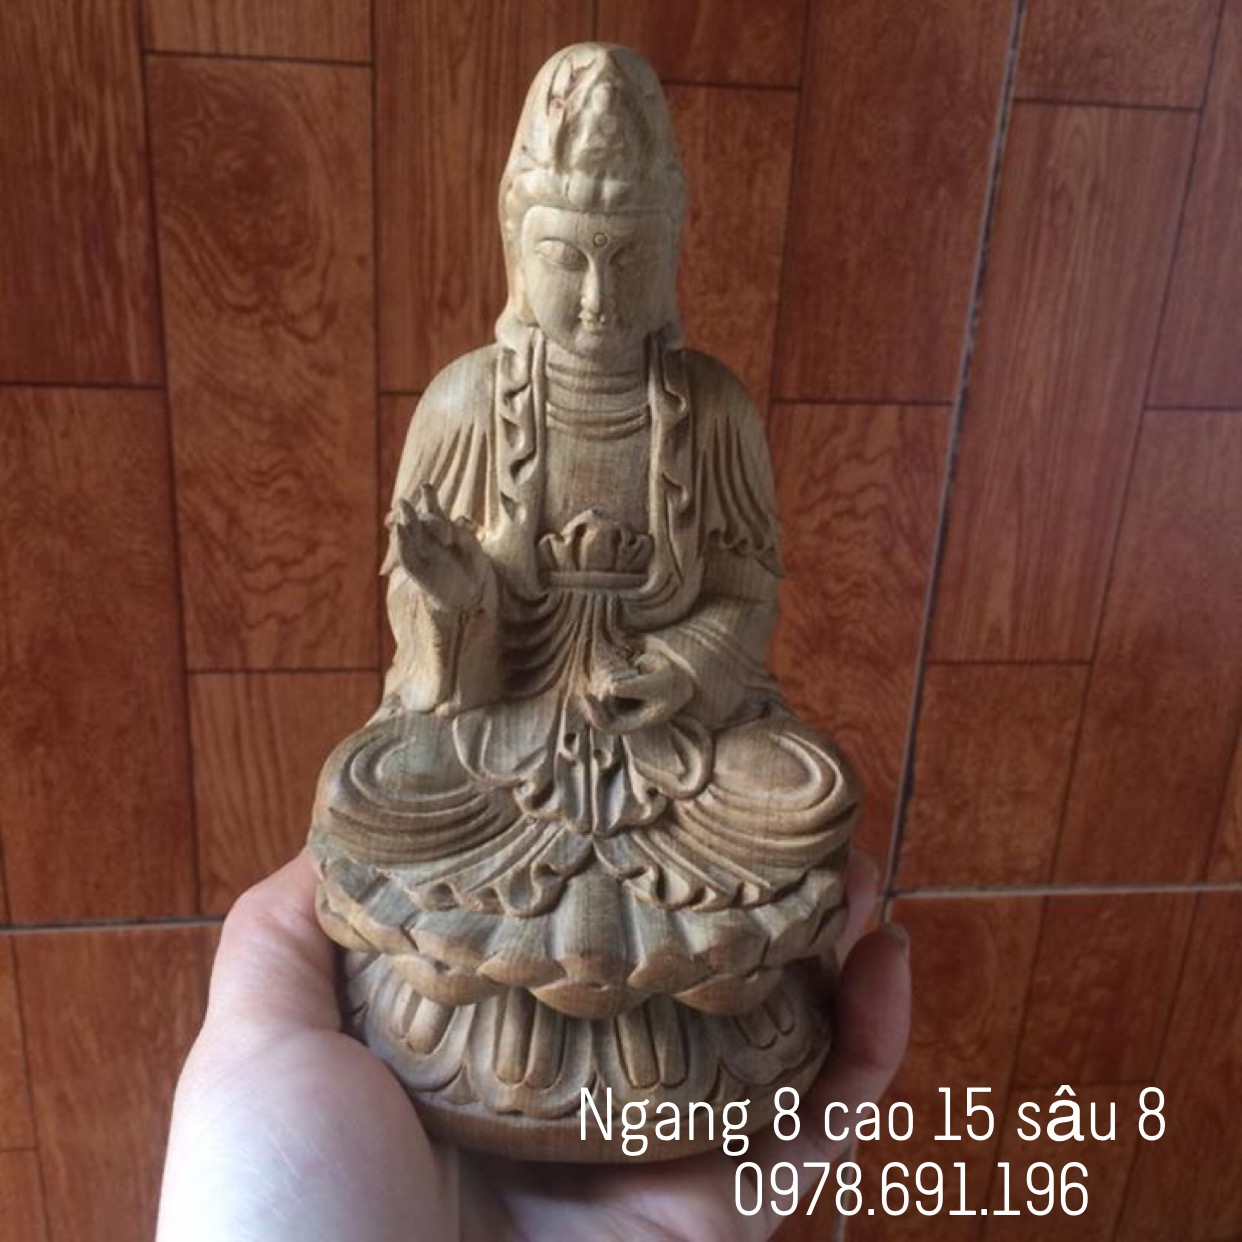 tuong-phat-ba-quan-am-go-ngoc-am